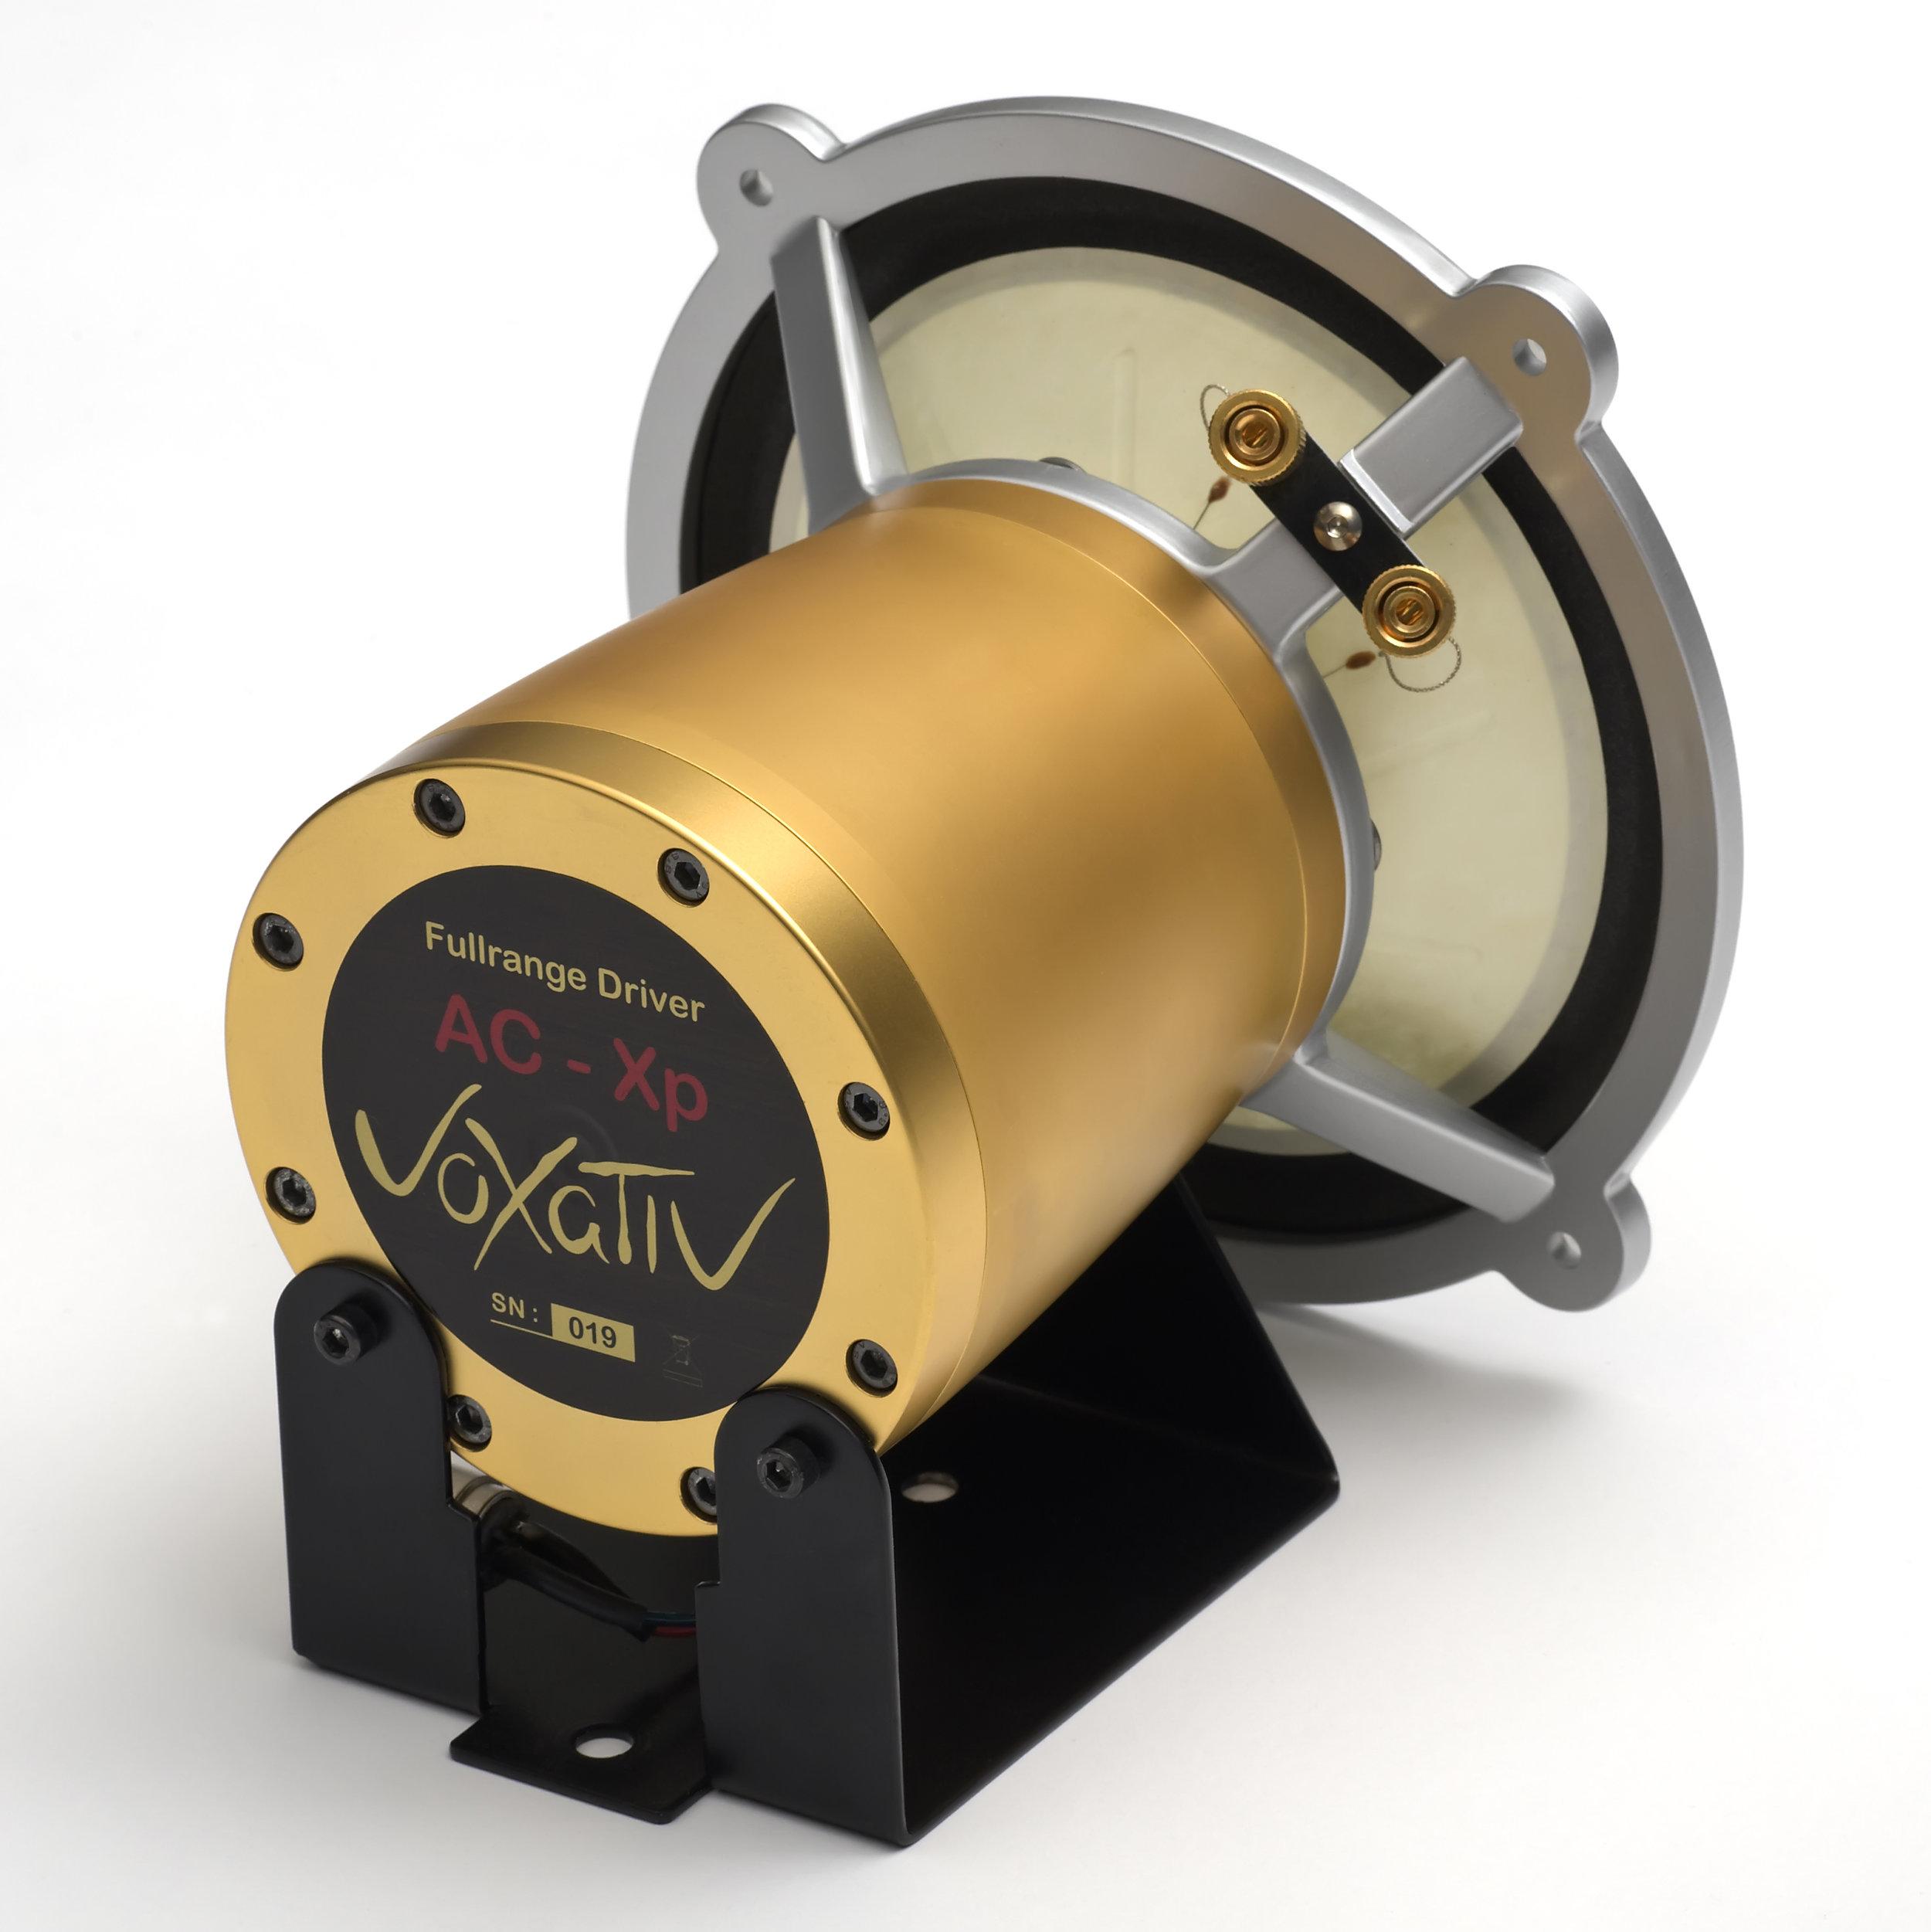 DUE配备了Voxativ AC-XP fieldcoil驱动器- 没有别的。 - 没有任何交叉组件或内部电子设备。这款雕像般的扬声器的著名声音完全由驱动器和机柜一起工作的机械卓越性优化。